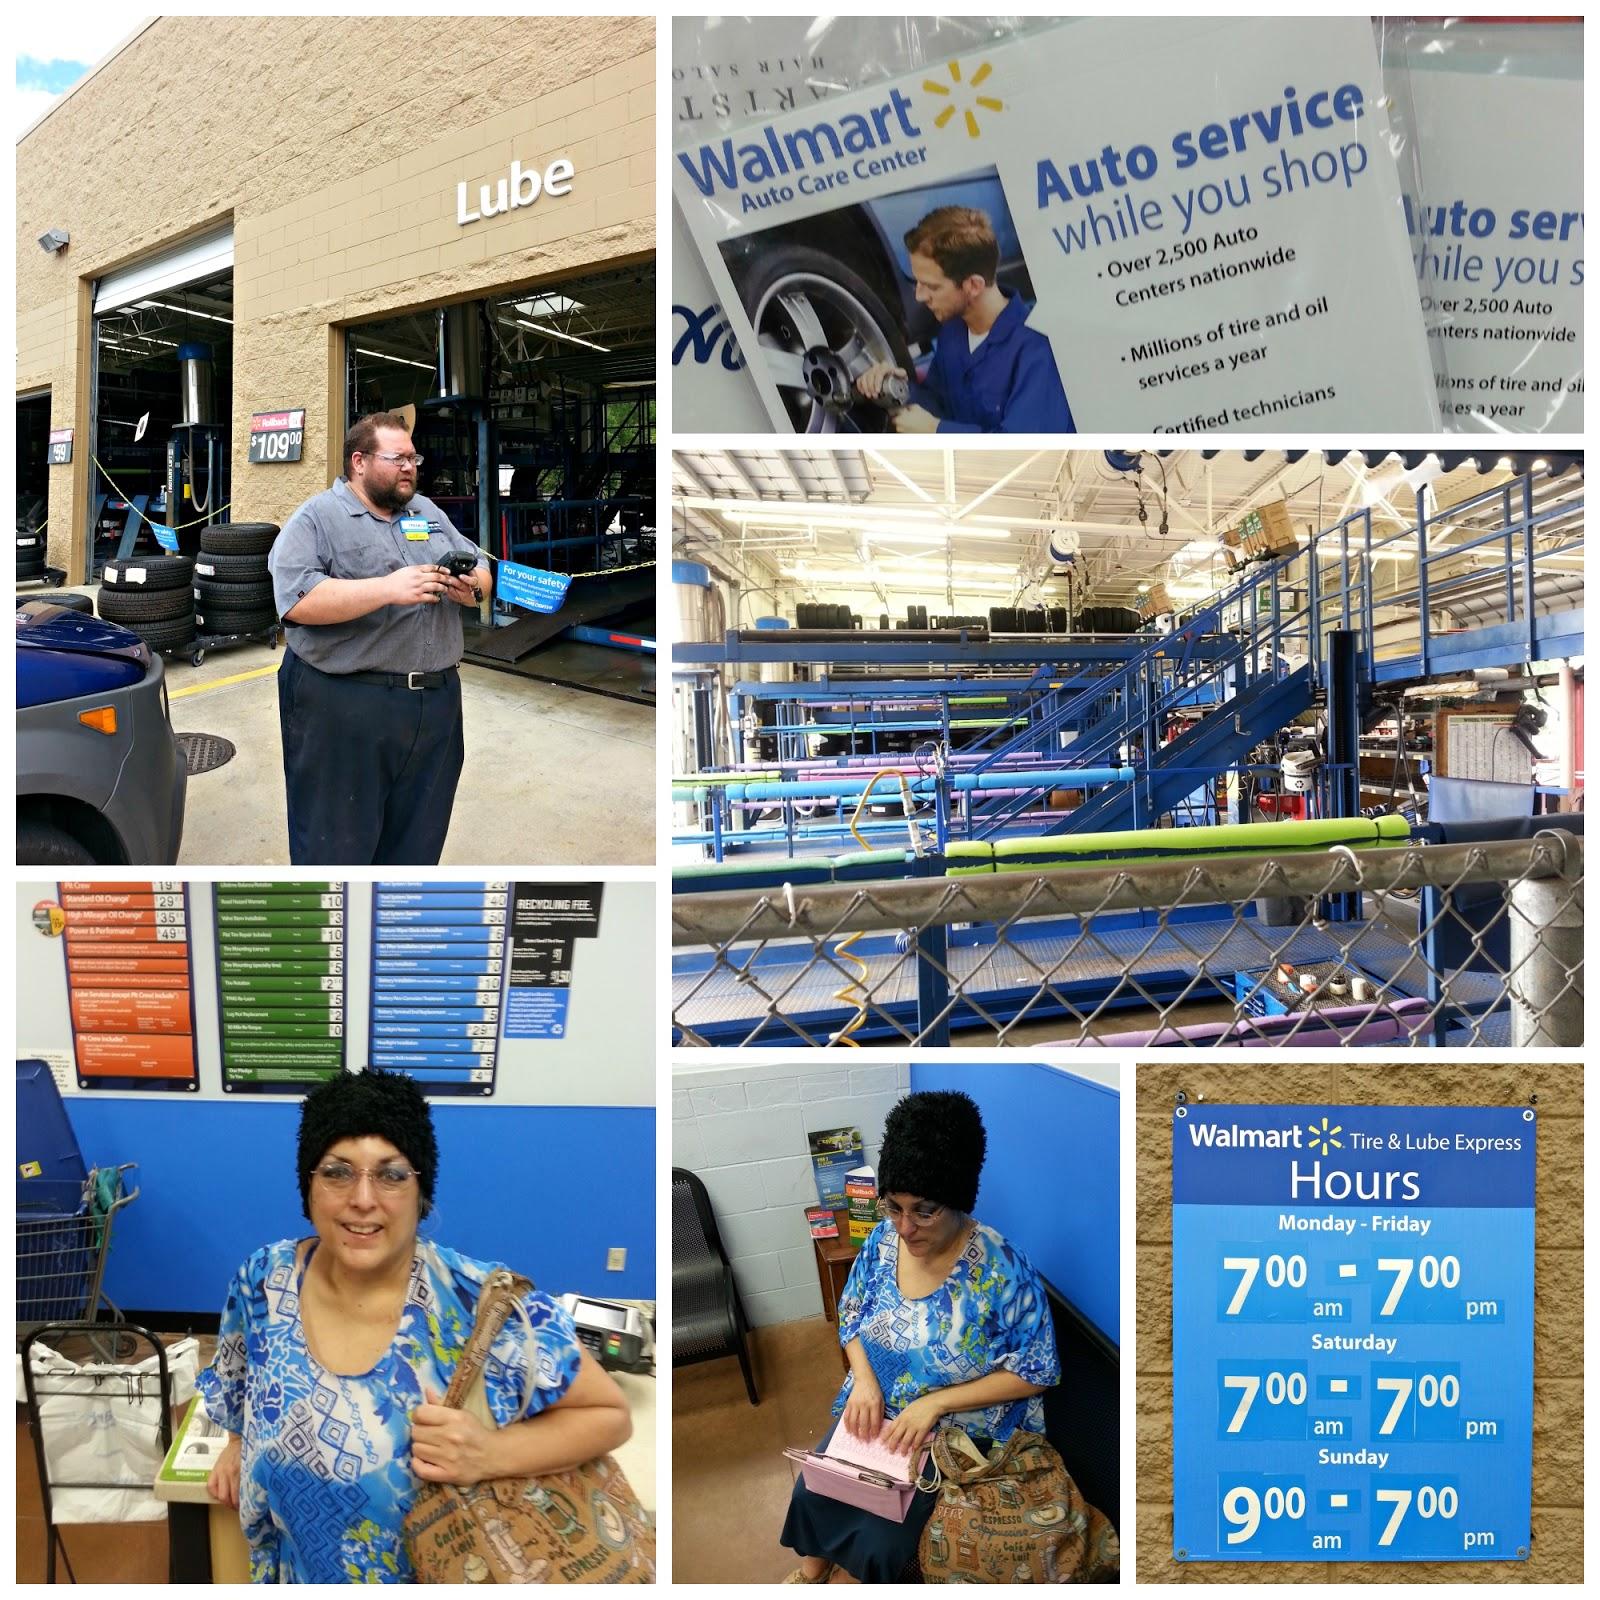 Walmart Auto Service Merritt Island Fl